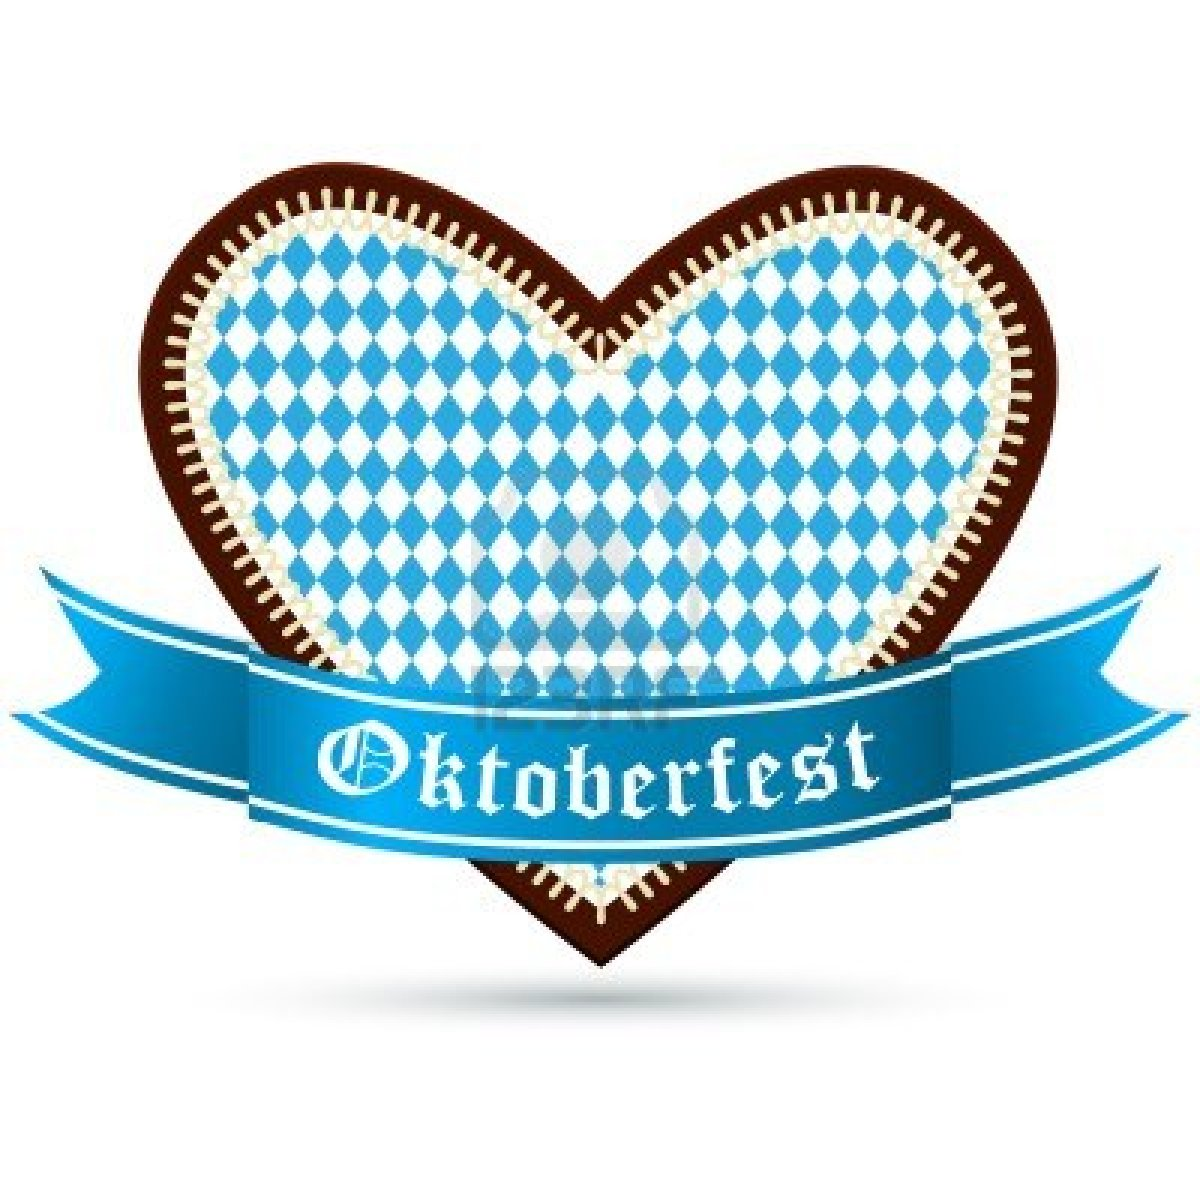 Clipart oktoberfest kostenlos clipart free stock Oktoberfest Logo Clipart - Clipart Kid clipart free stock